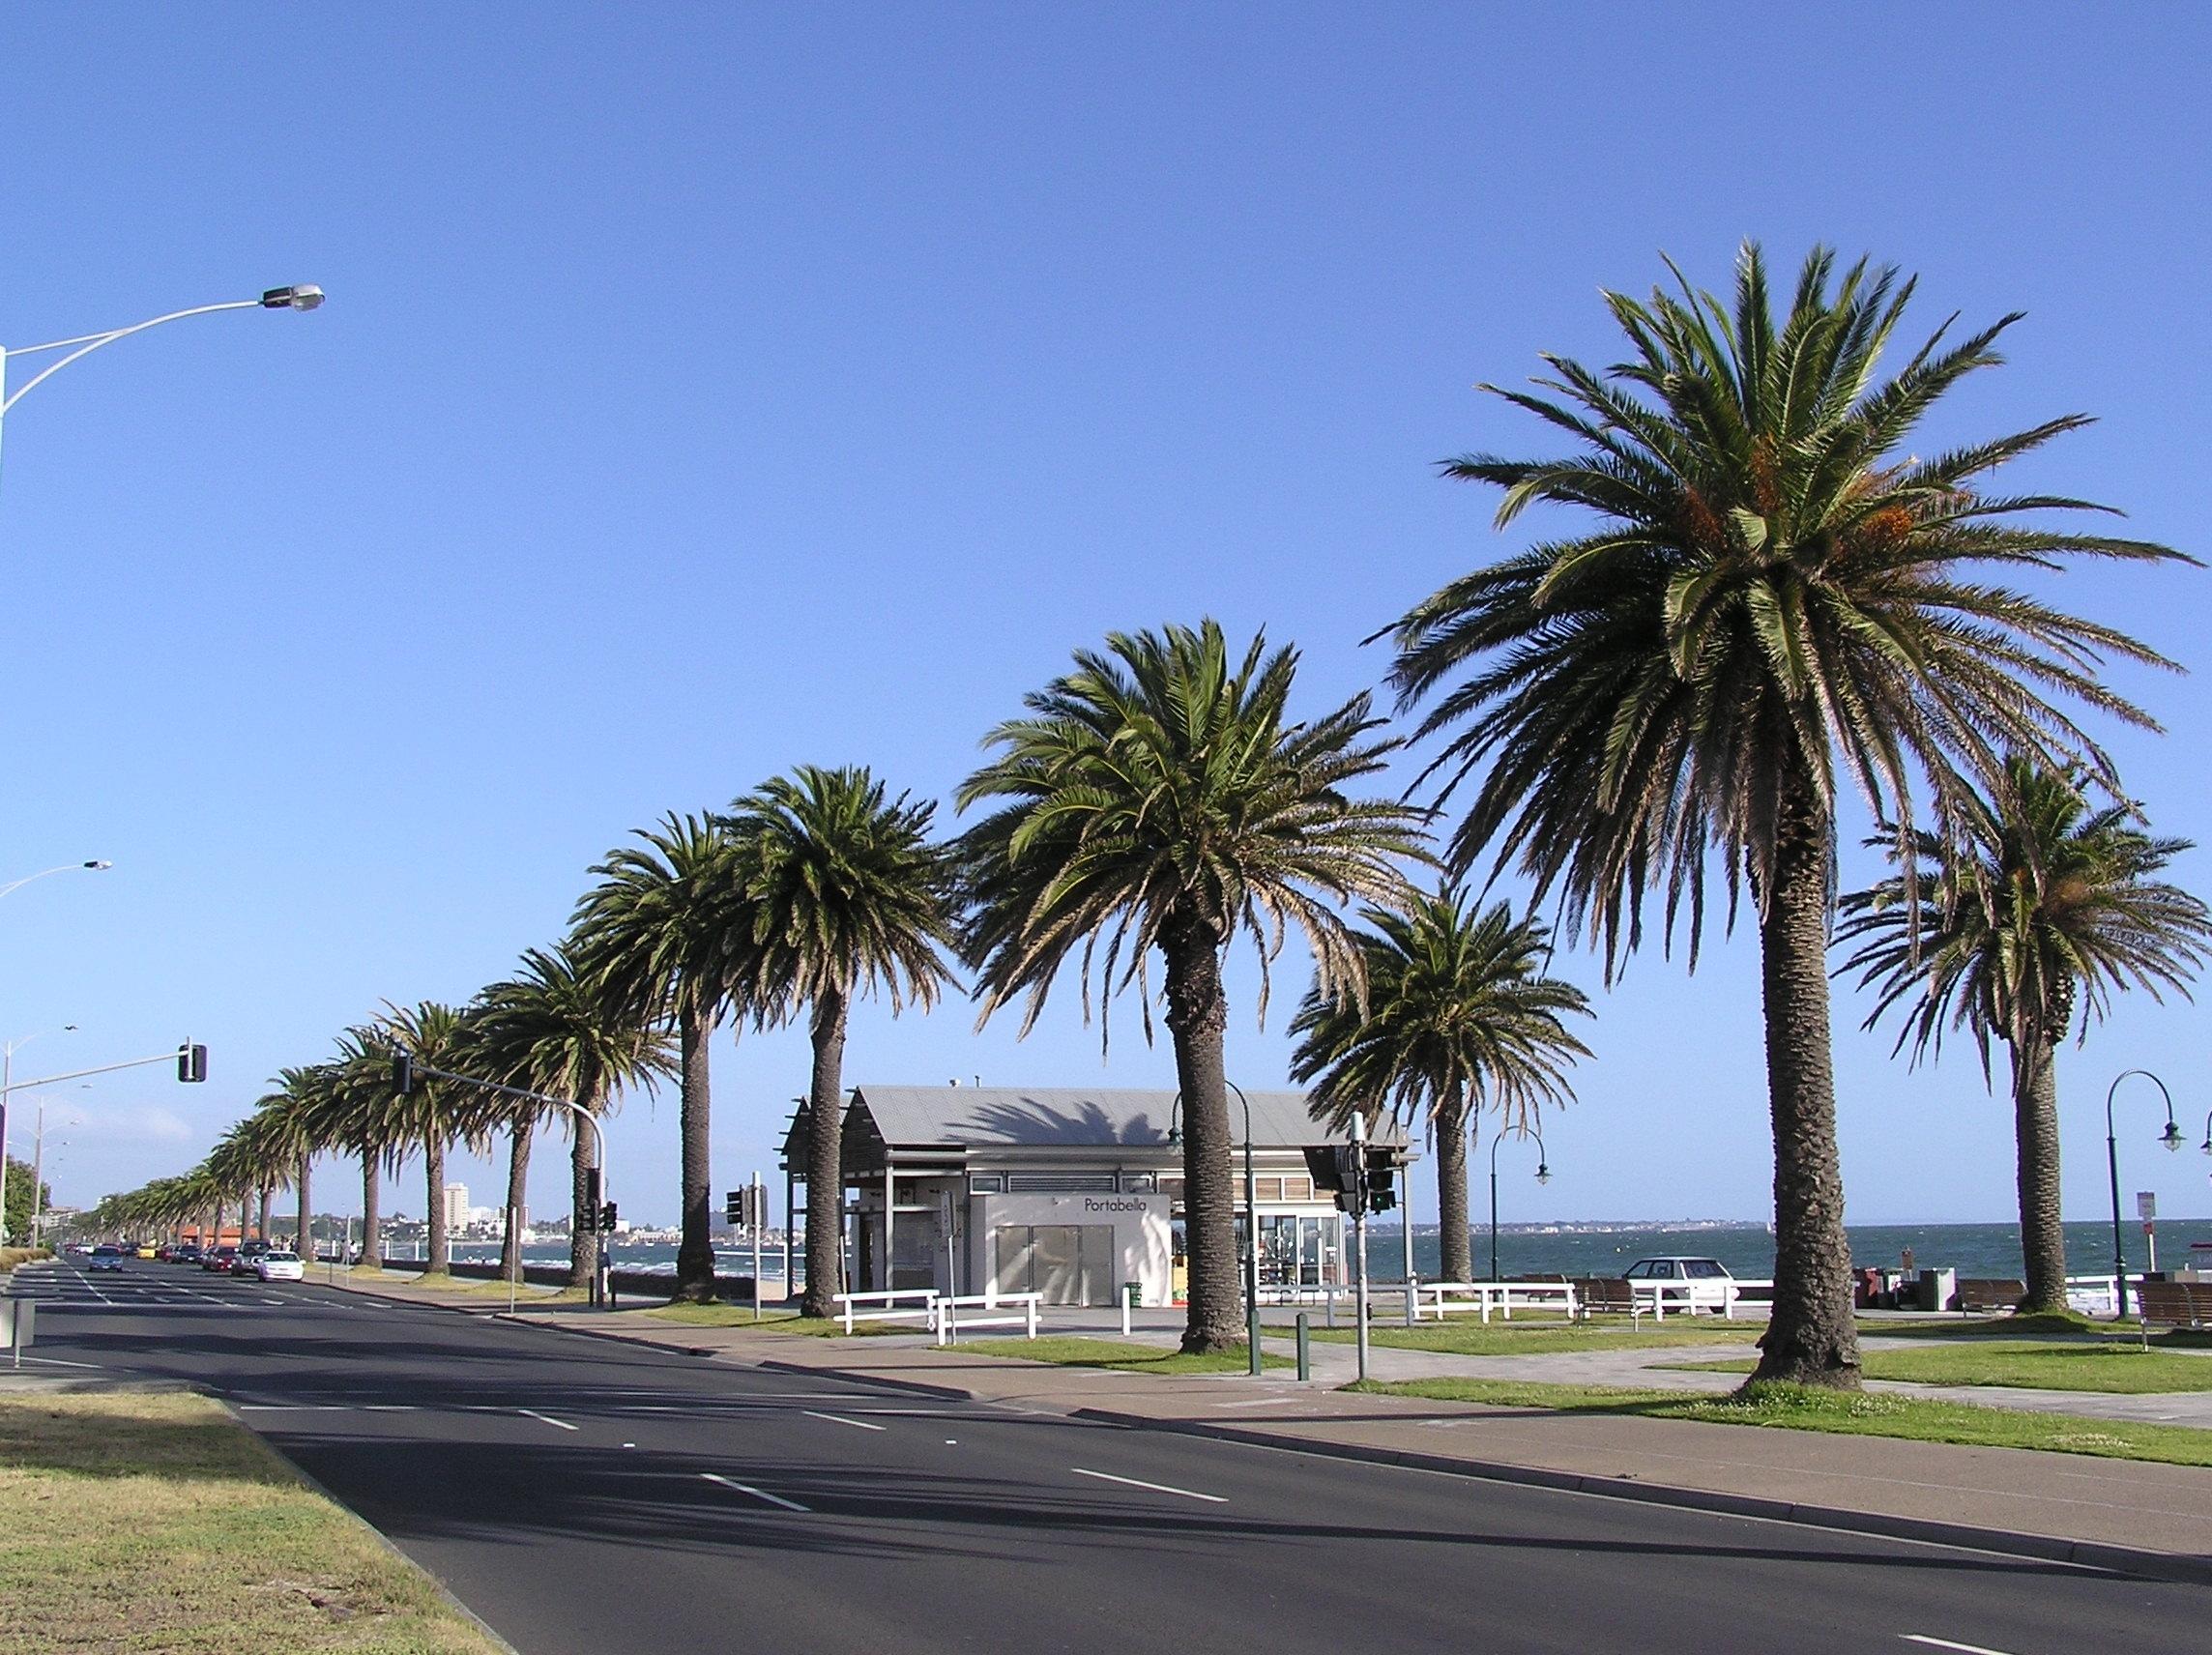 [Image: Port_Melbourne_Bayside_Foreshore_Promenade.jpg]